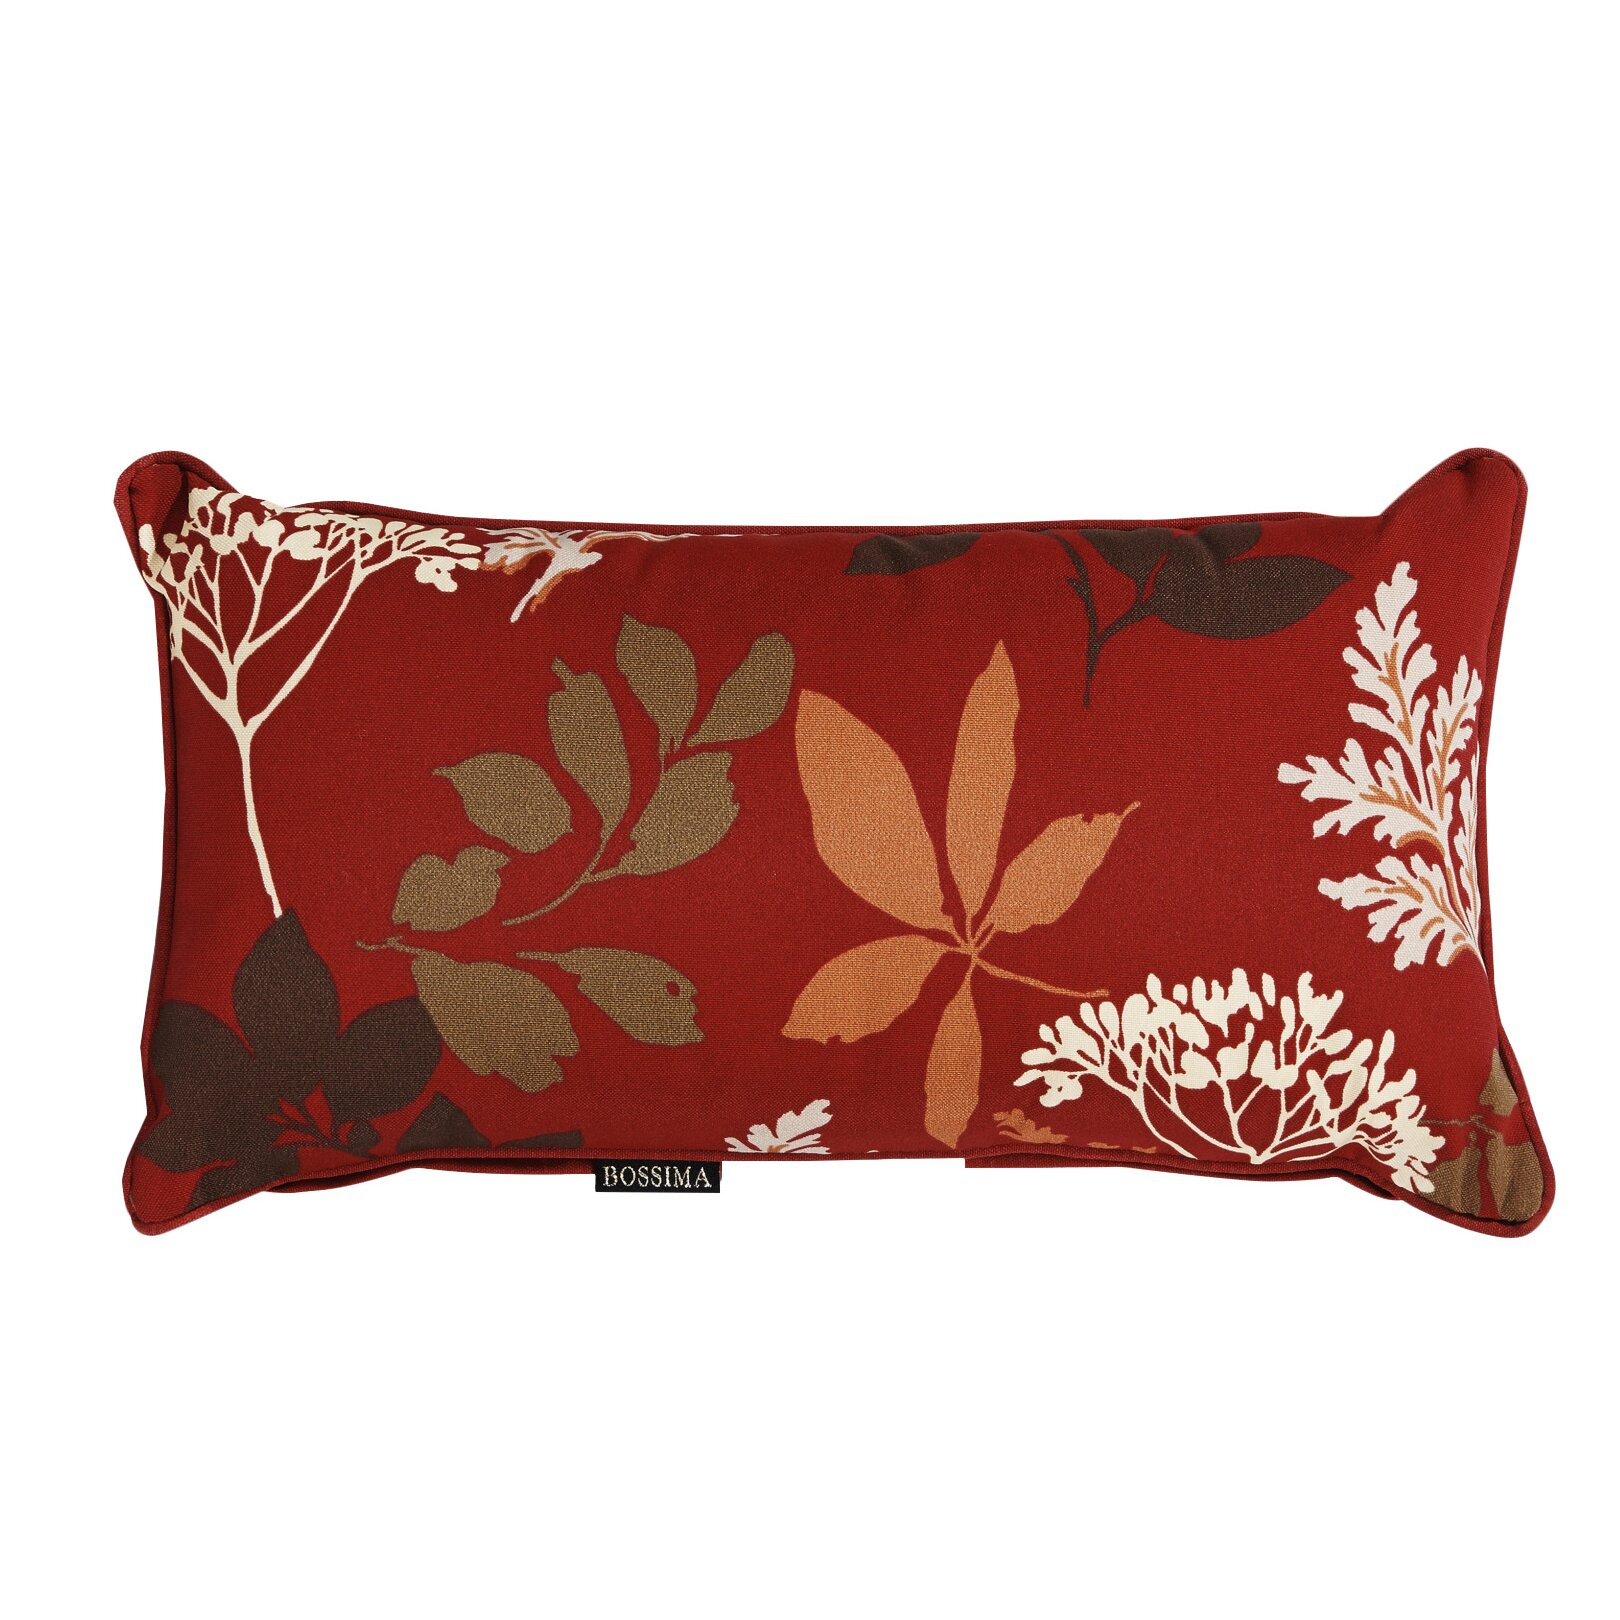 Bossima Outdoor Throw Pillow & Reviews Wayfair